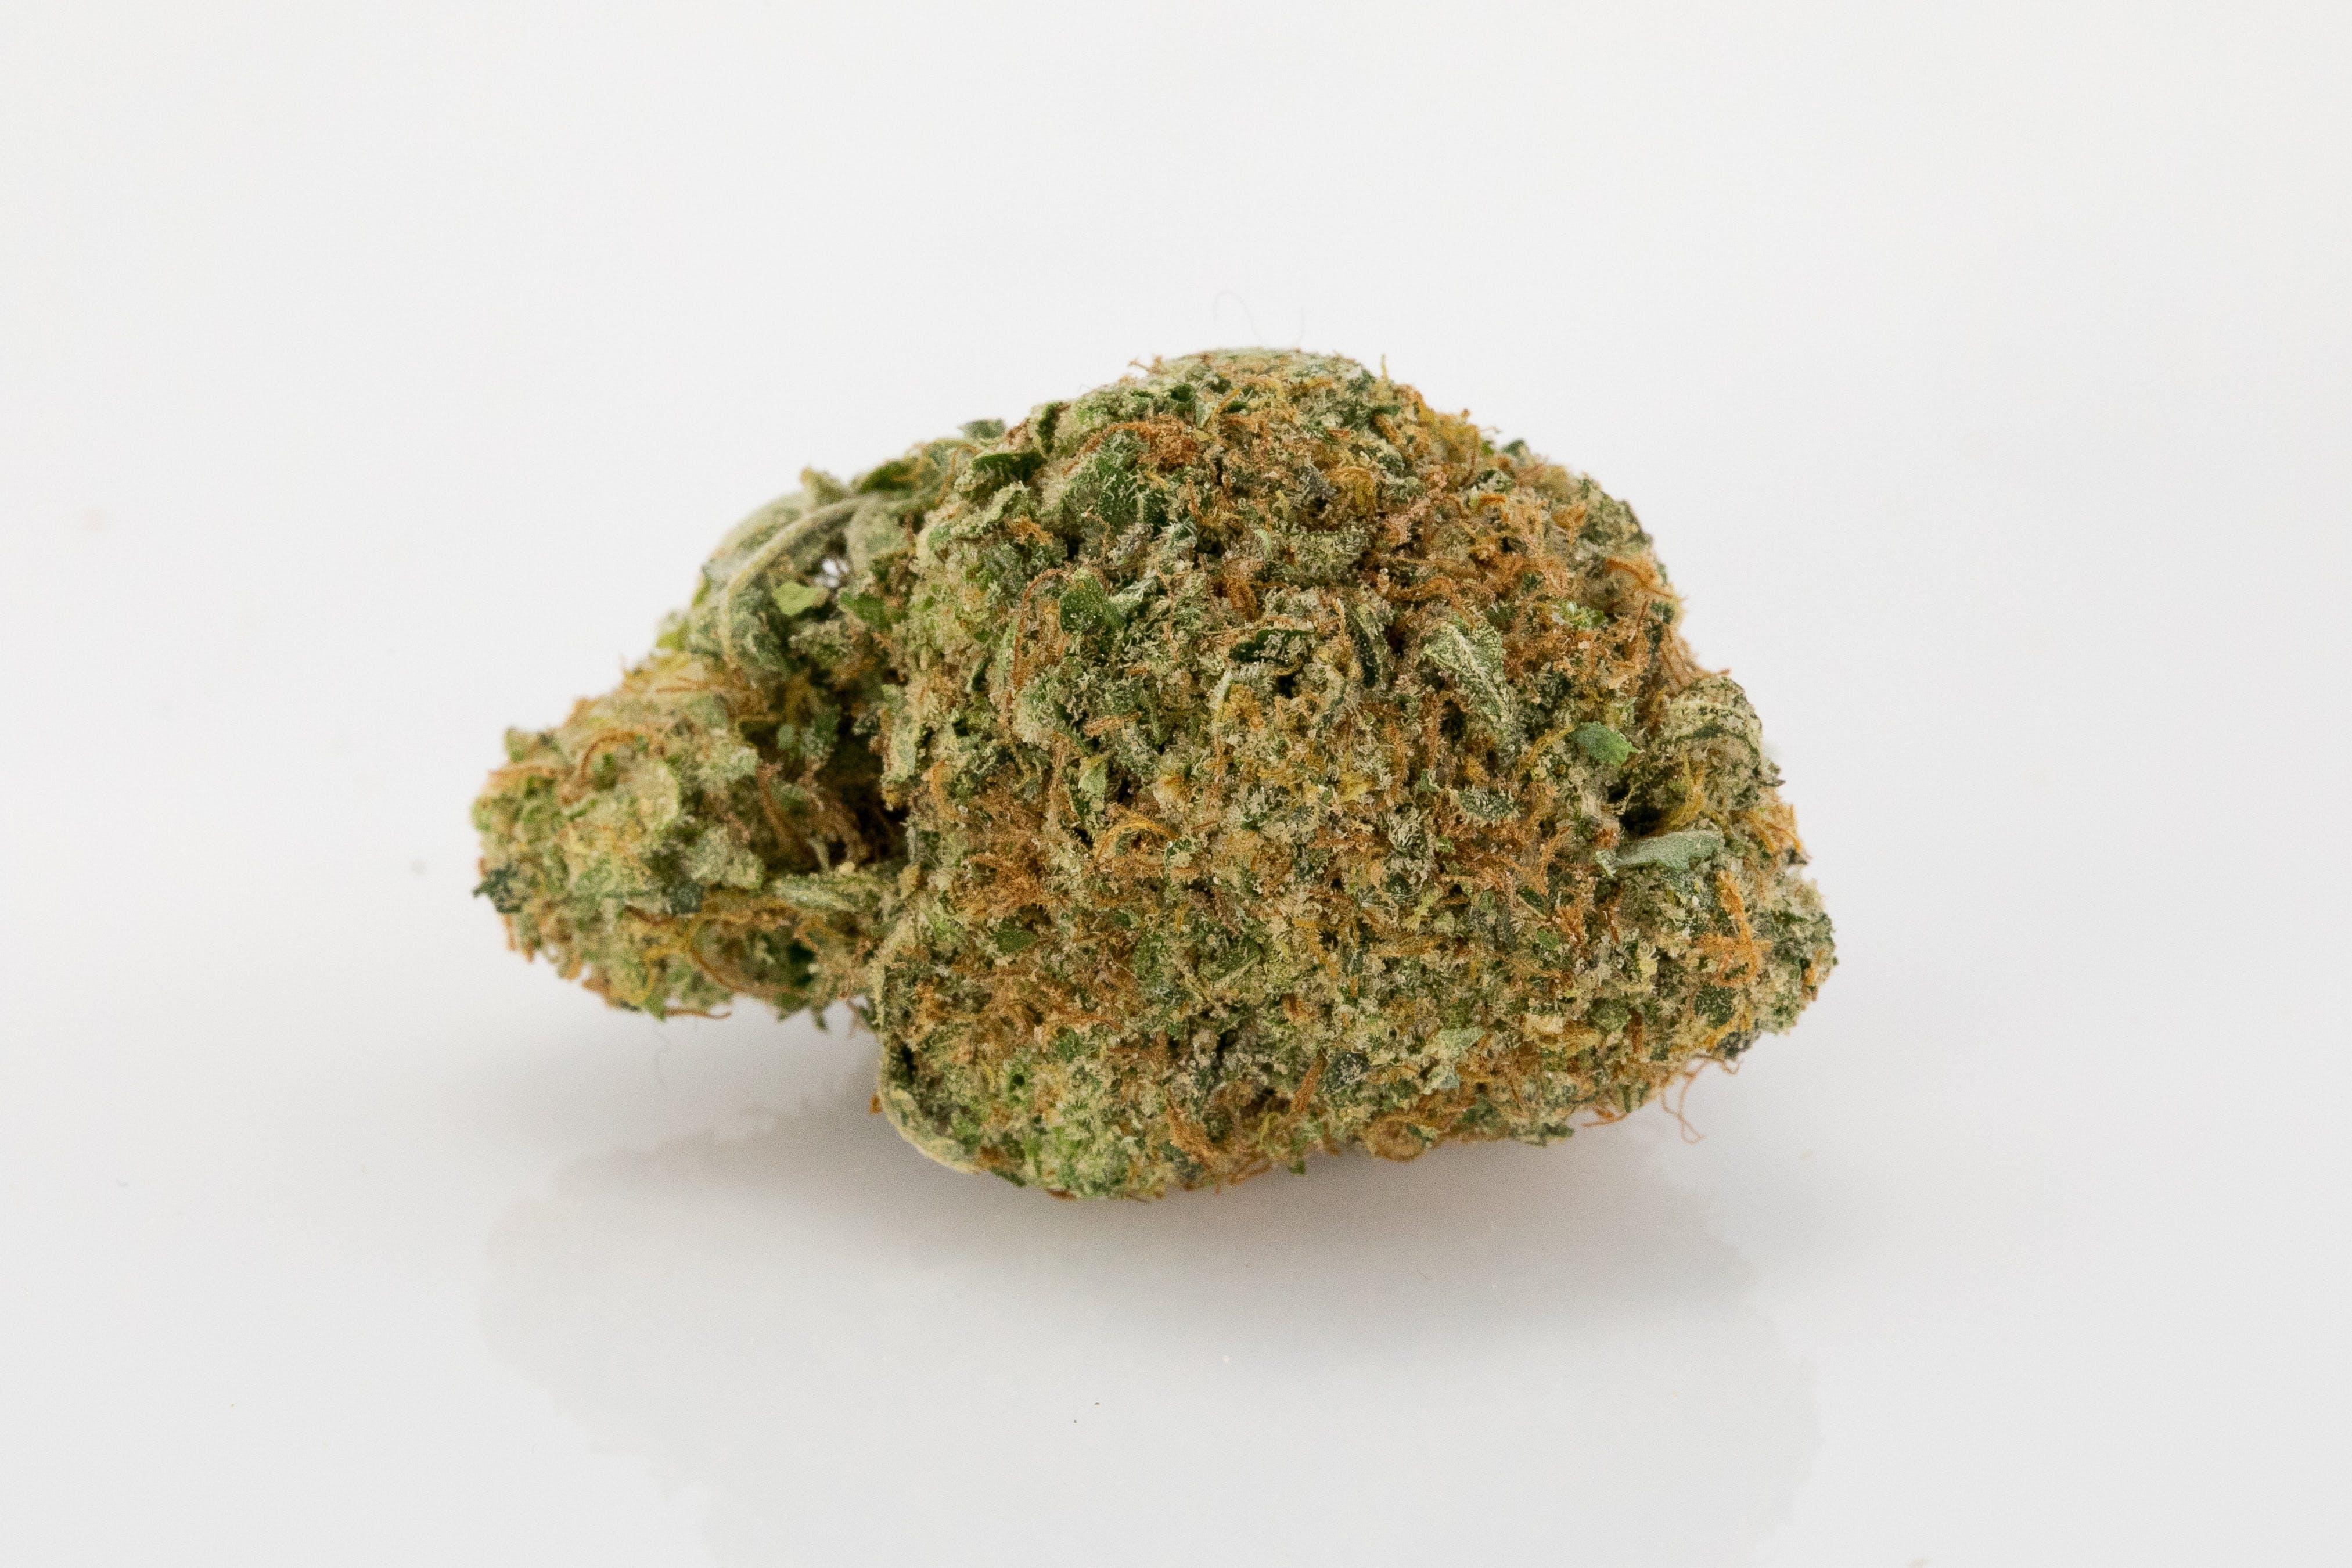 The OG 18 Marijuana Strain 7 New Ways Cannabis Will Dominate Your Wellness Regime